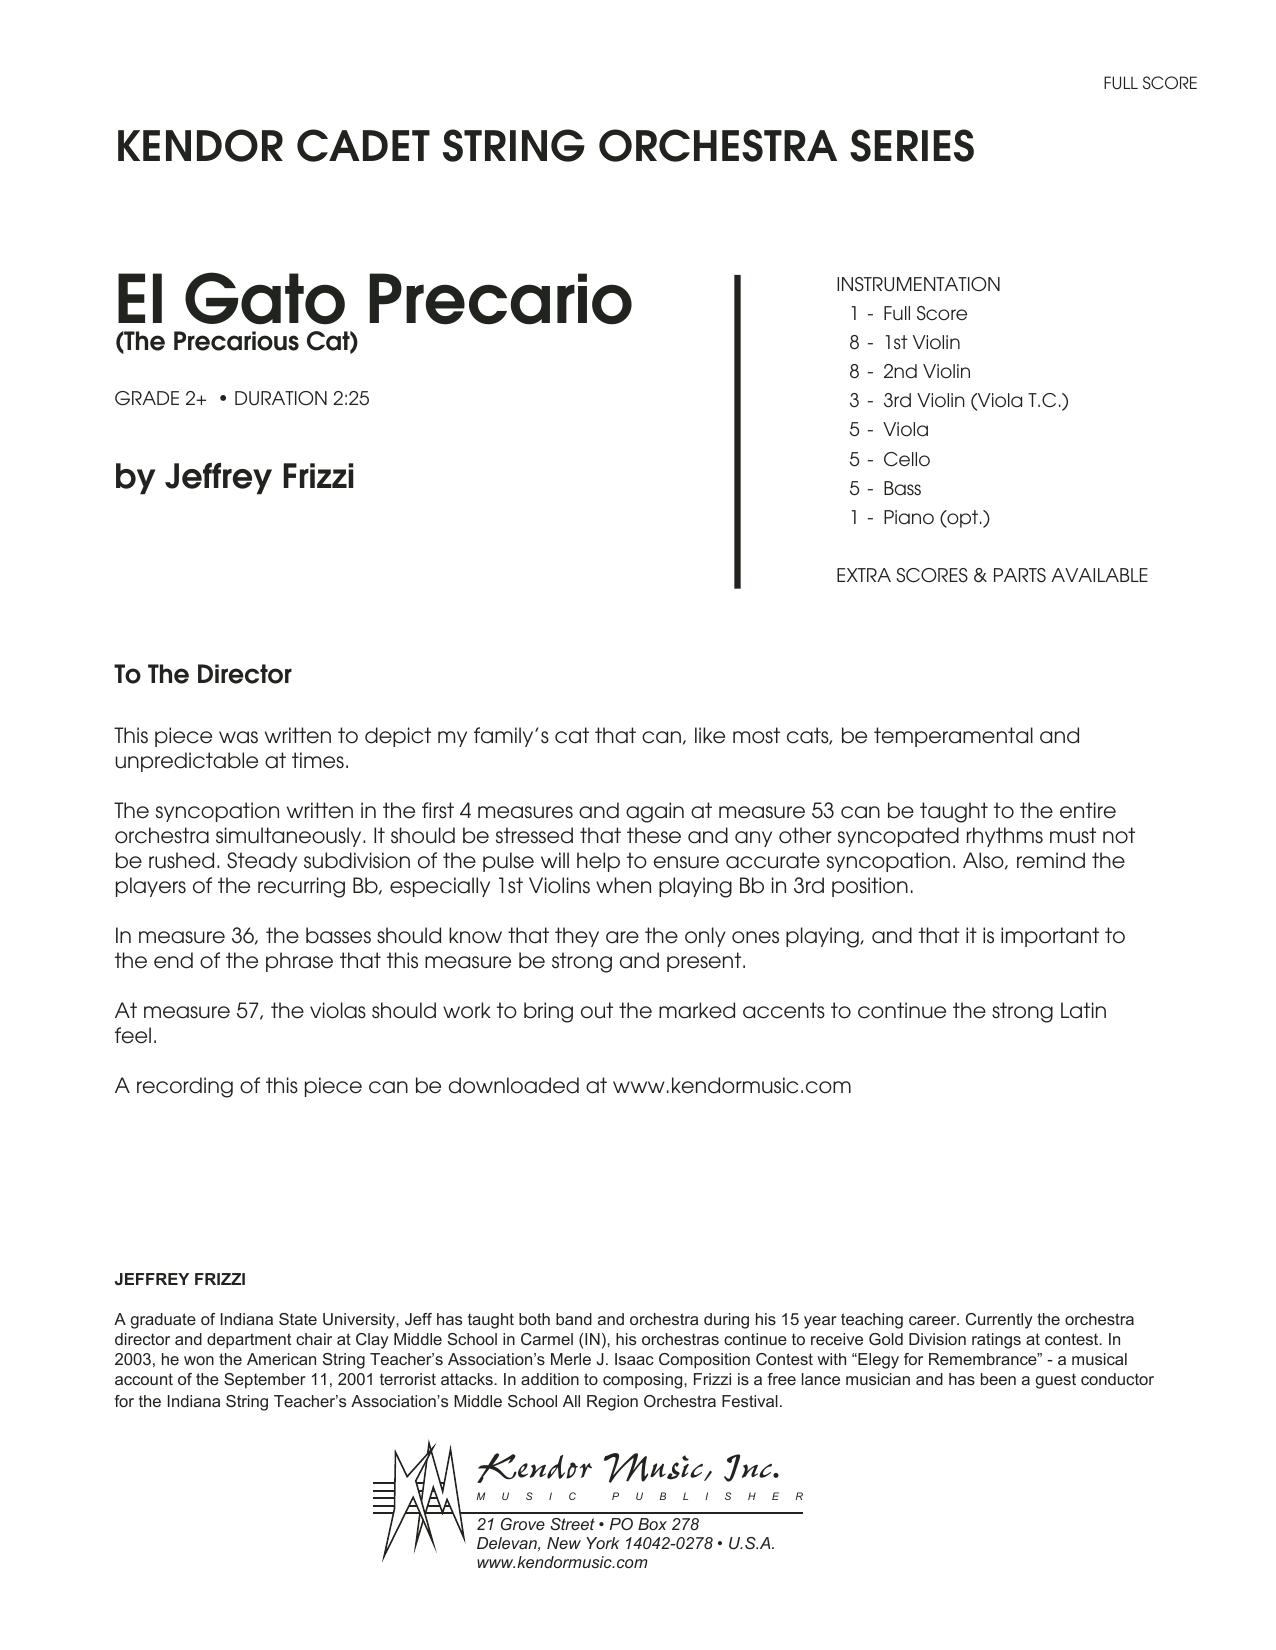 El Gato Precario (The Precarious Cat) (COMPLETE) sheet music for orchestra by Jeffrey Frizzi. Score Image Preview.